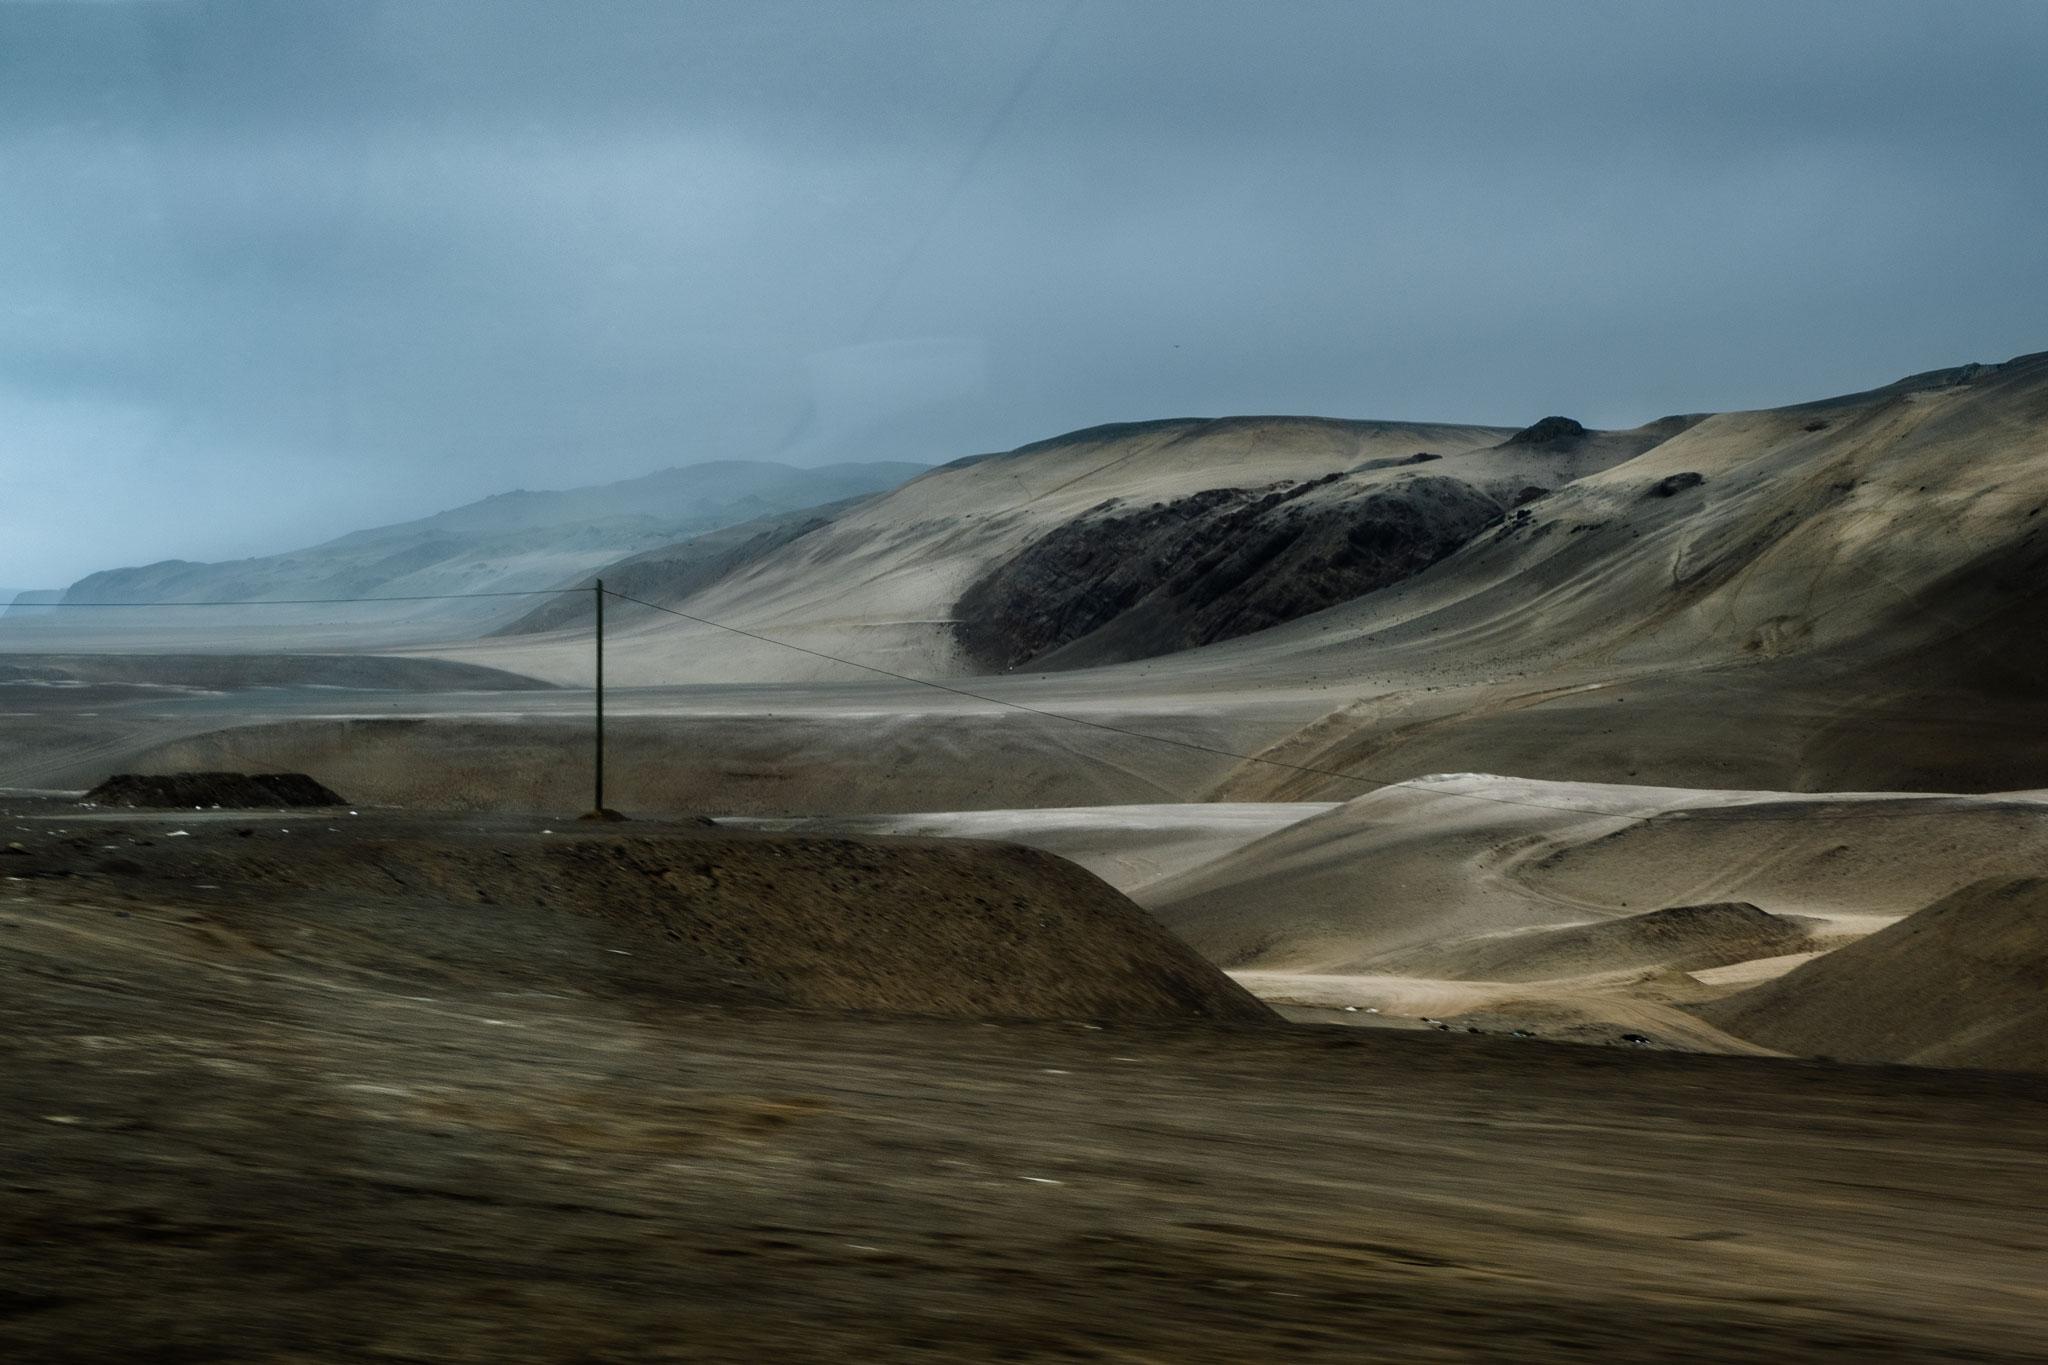 landscape-along-the-panamericana-peru